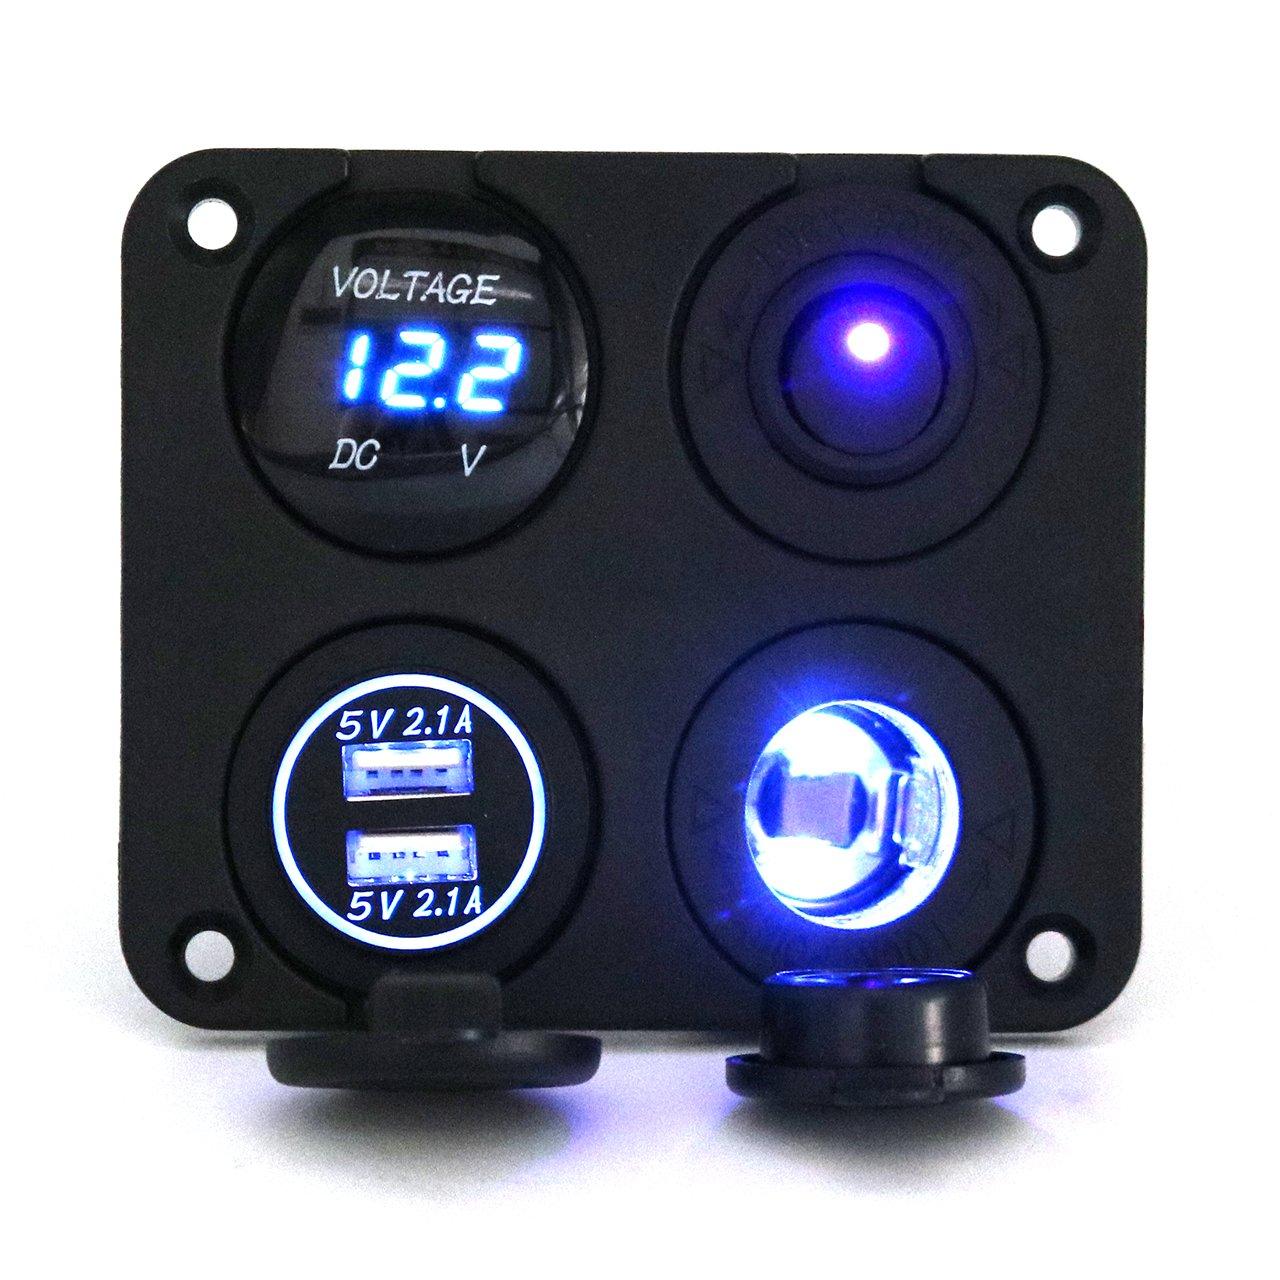 Cheap Led Rocker Switch Wiring Find Deals 12 Volt Round On Illuminated Get Quotations Panel Ausdin Light Bar Dual Usb Socket 42a